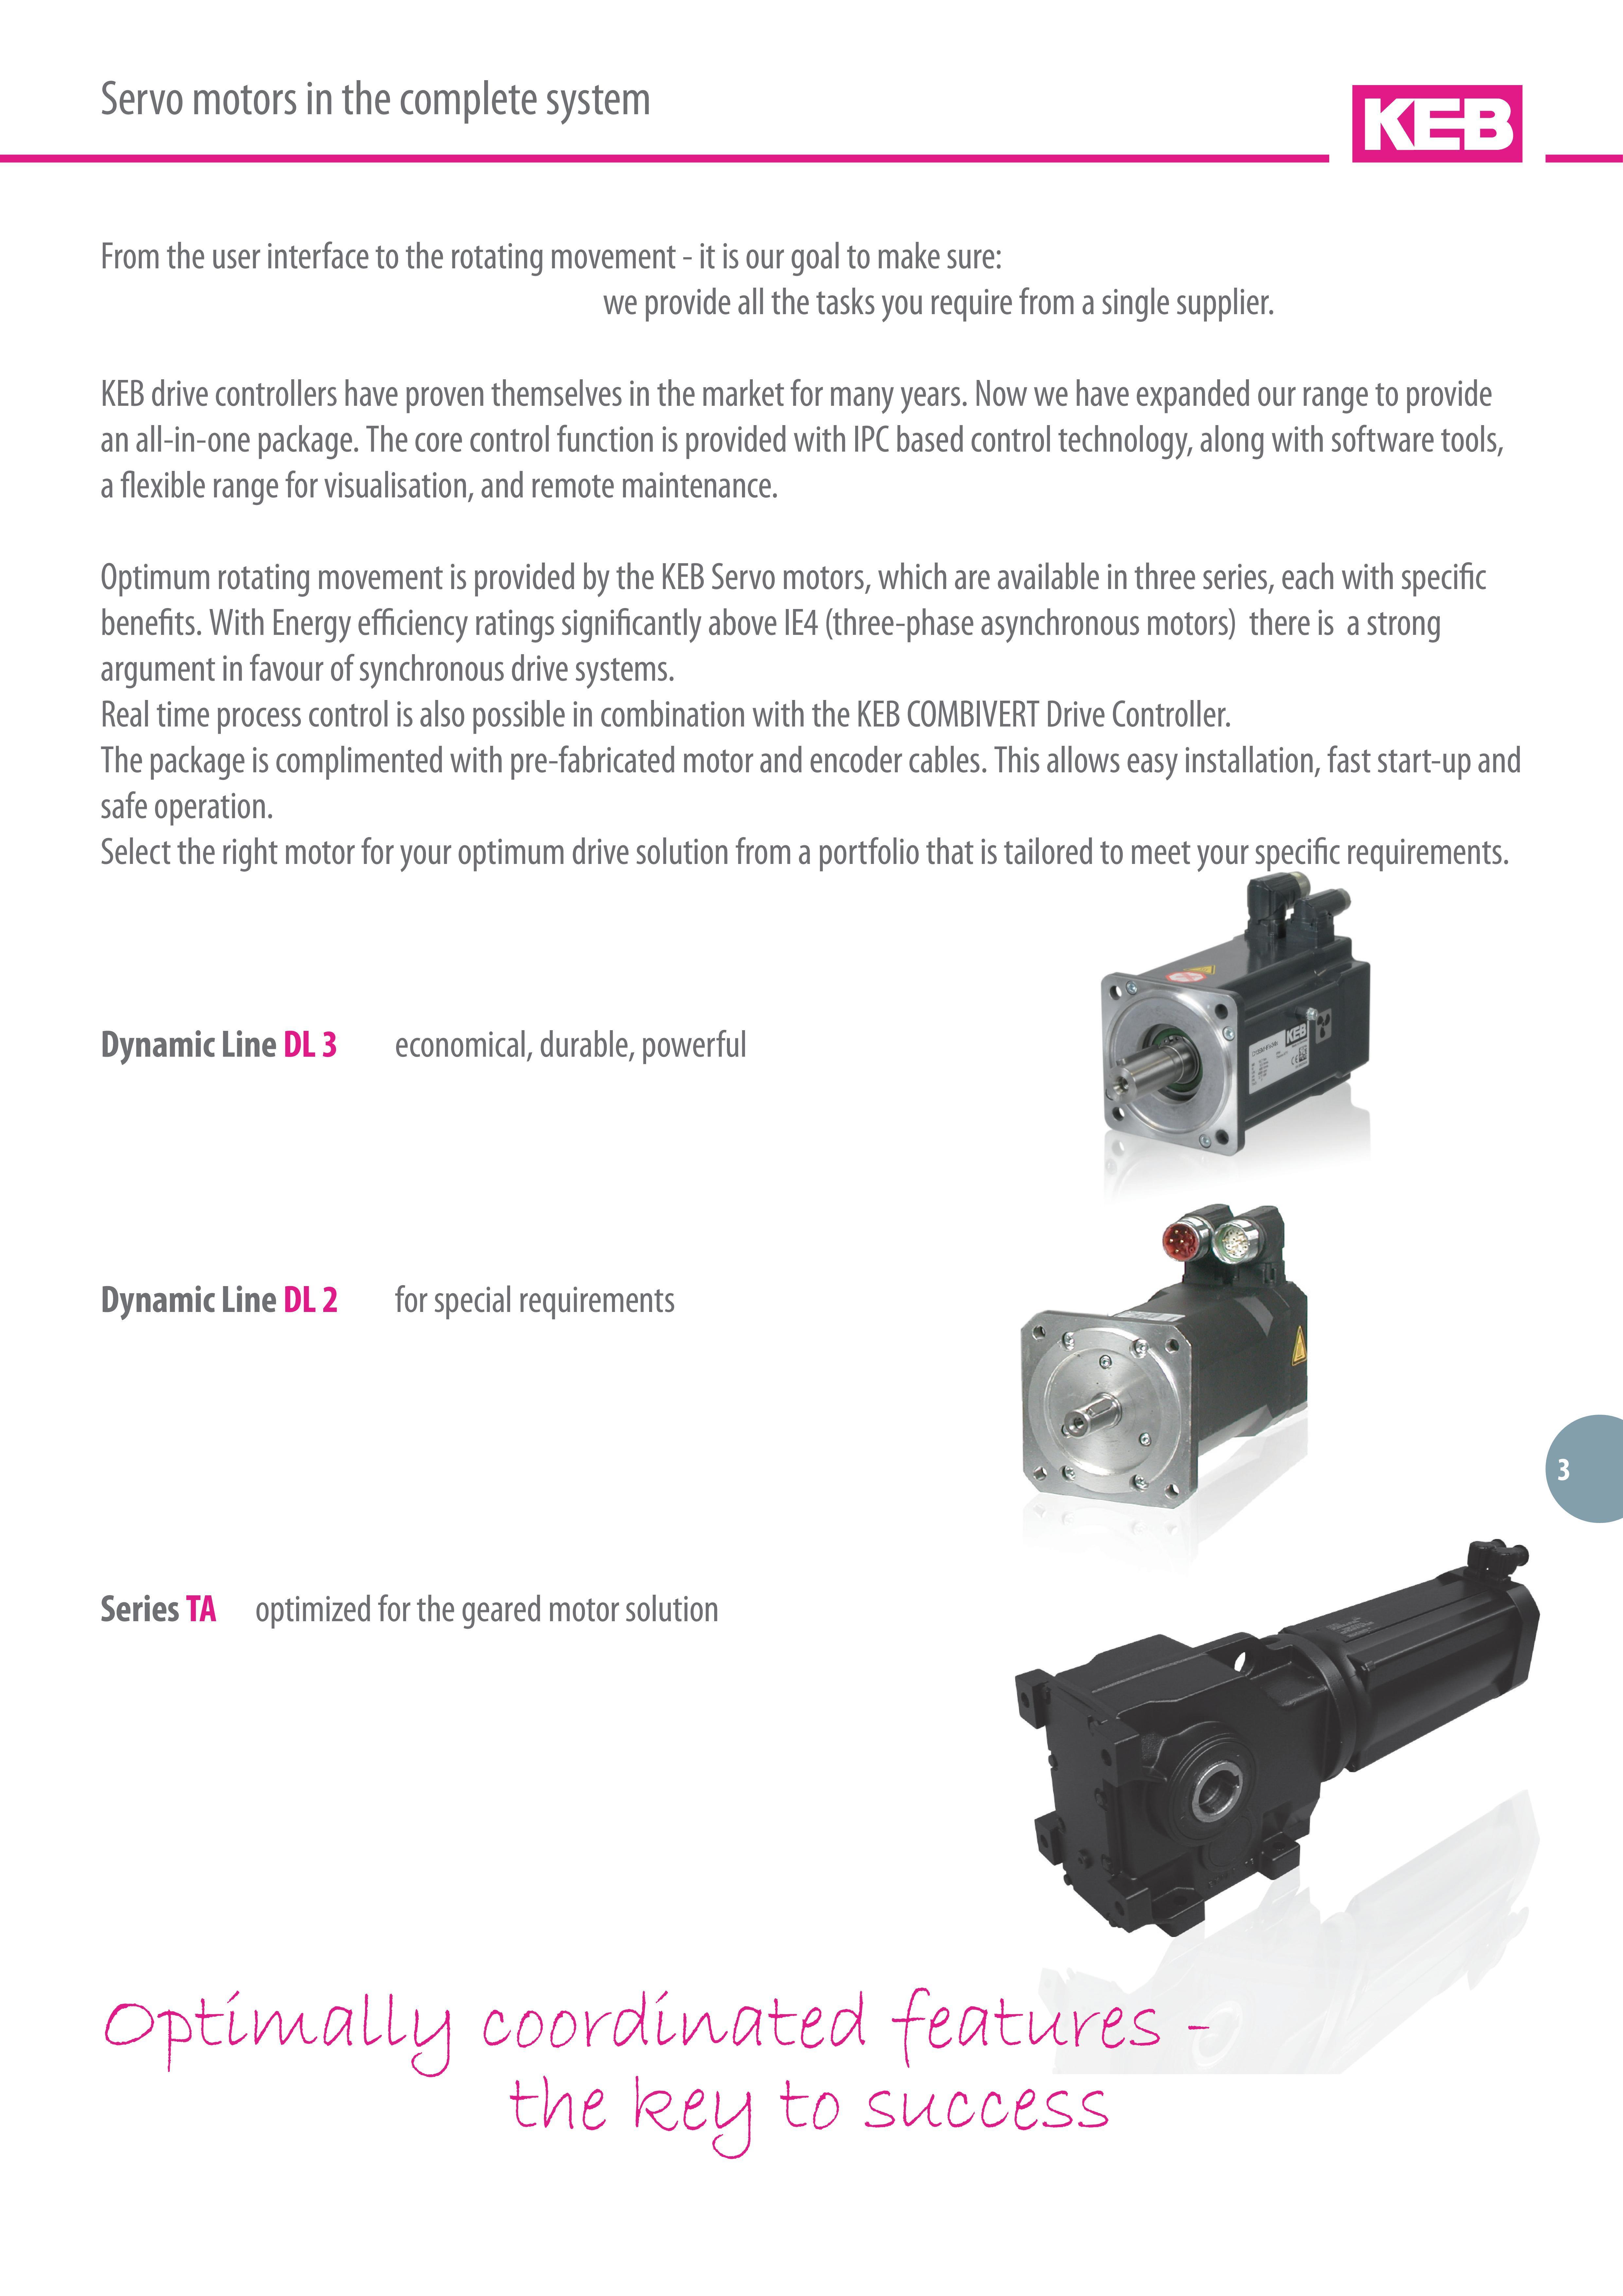 Servo Motors For Motion Control Application